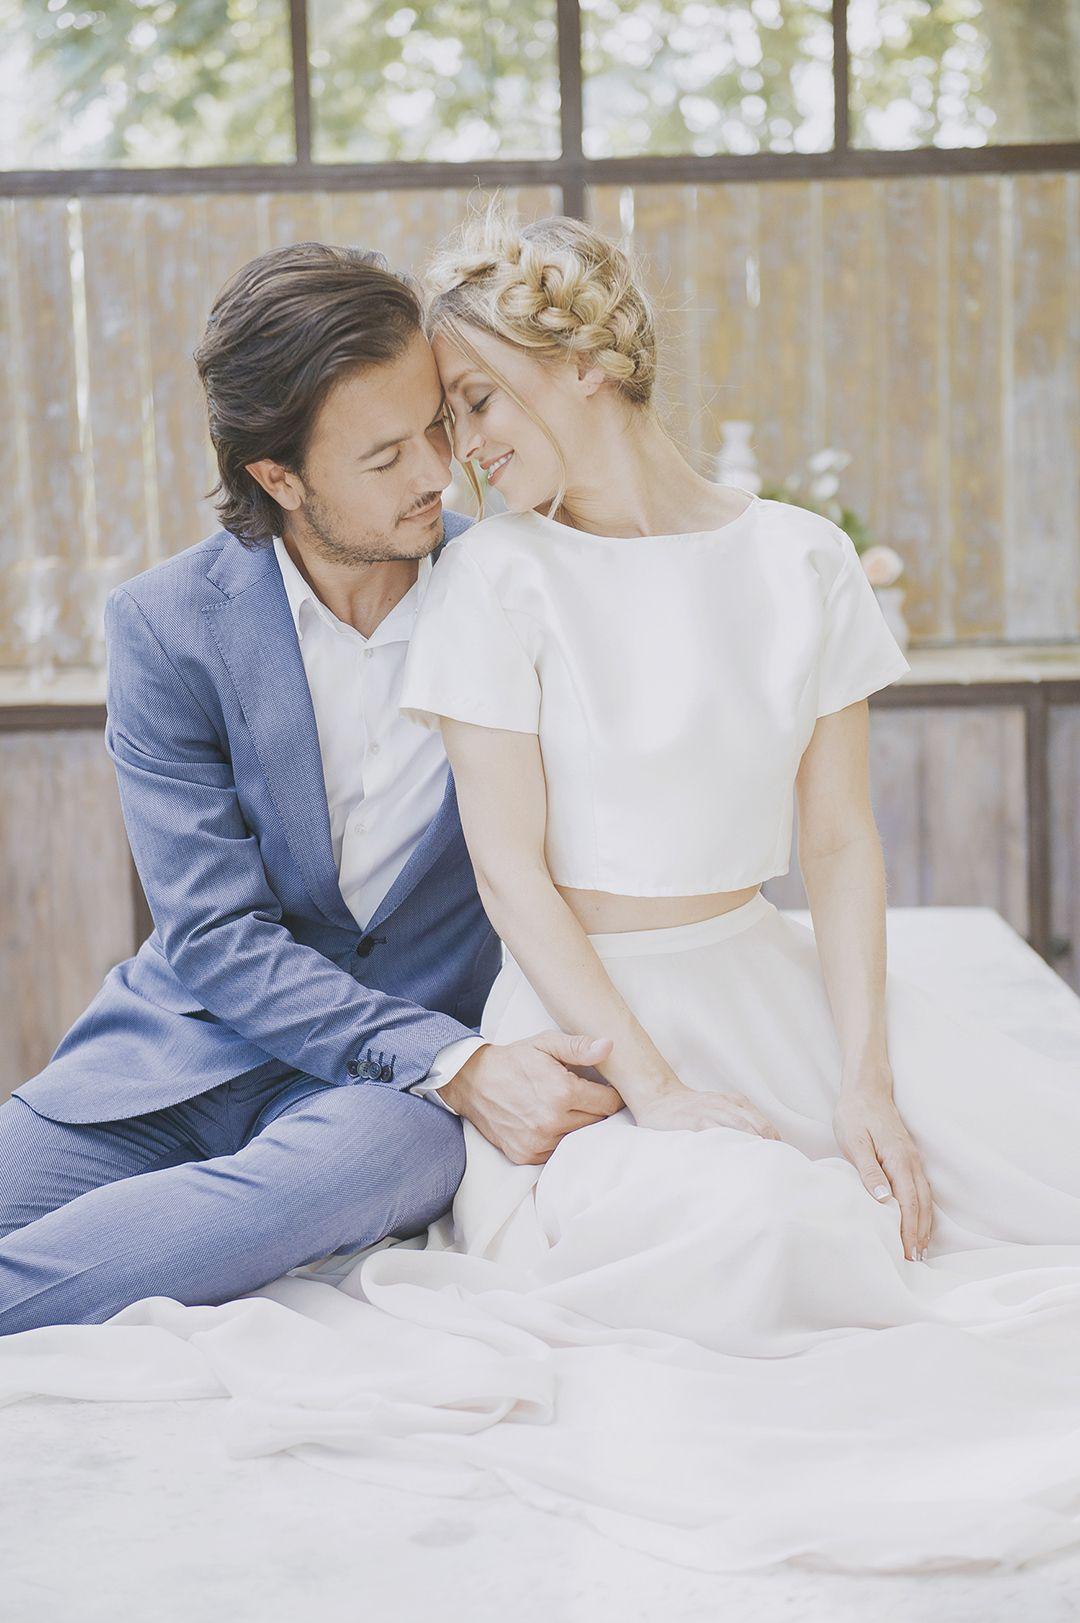 Will you marry me love shoot pre wedding idea pinterest